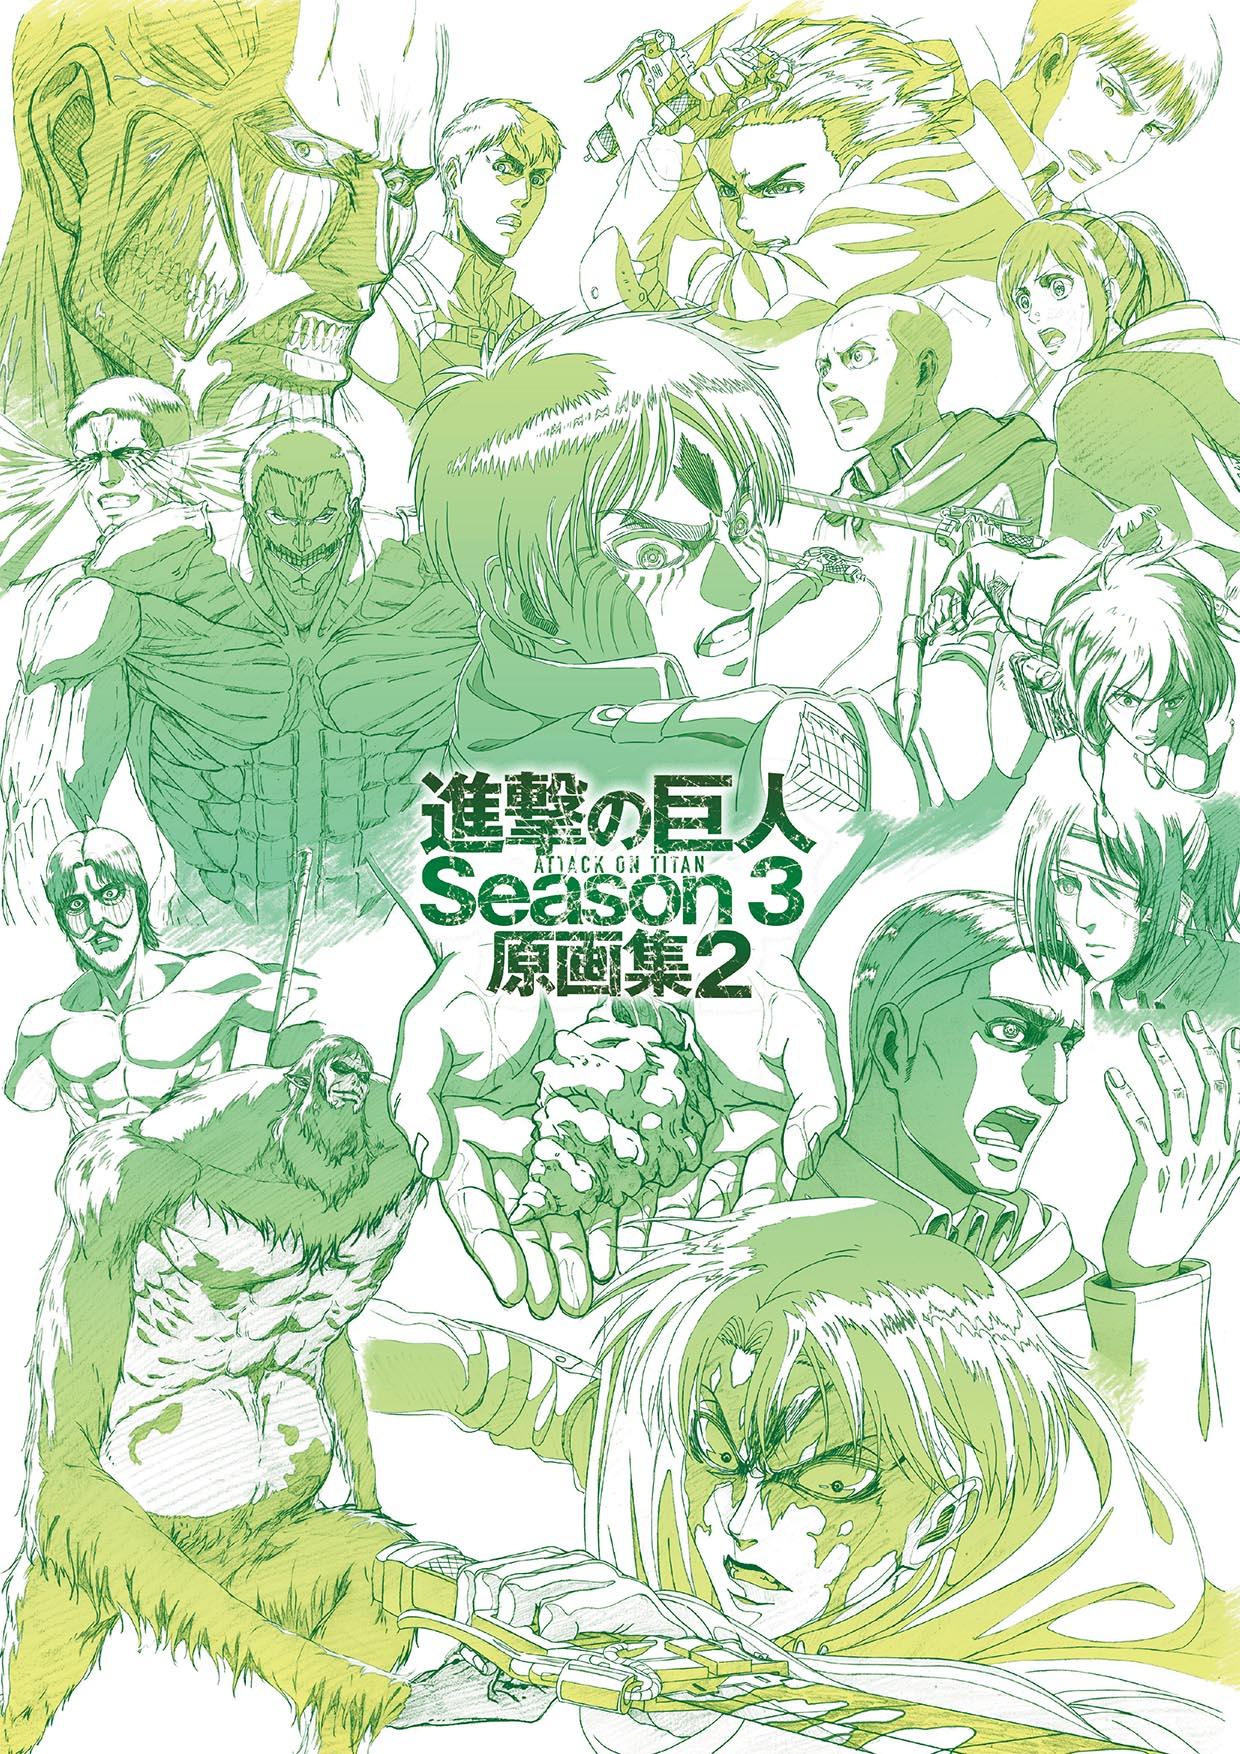 「TVアニメ進撃の巨人Season 3原画集2」発売記念イベント開催決定!